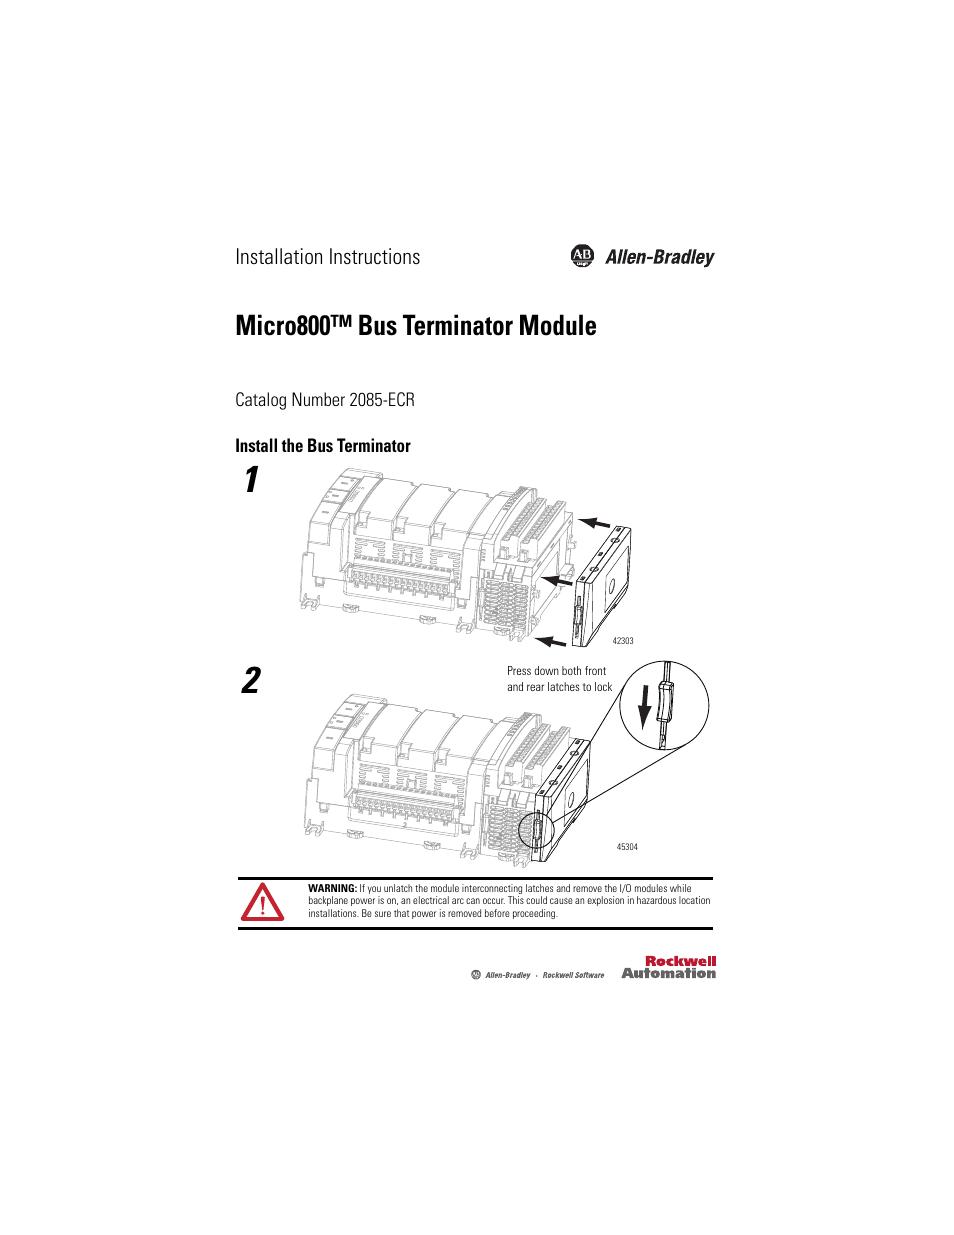 Rockwell Automation 2085-ECR Micro800 Bus Terminator